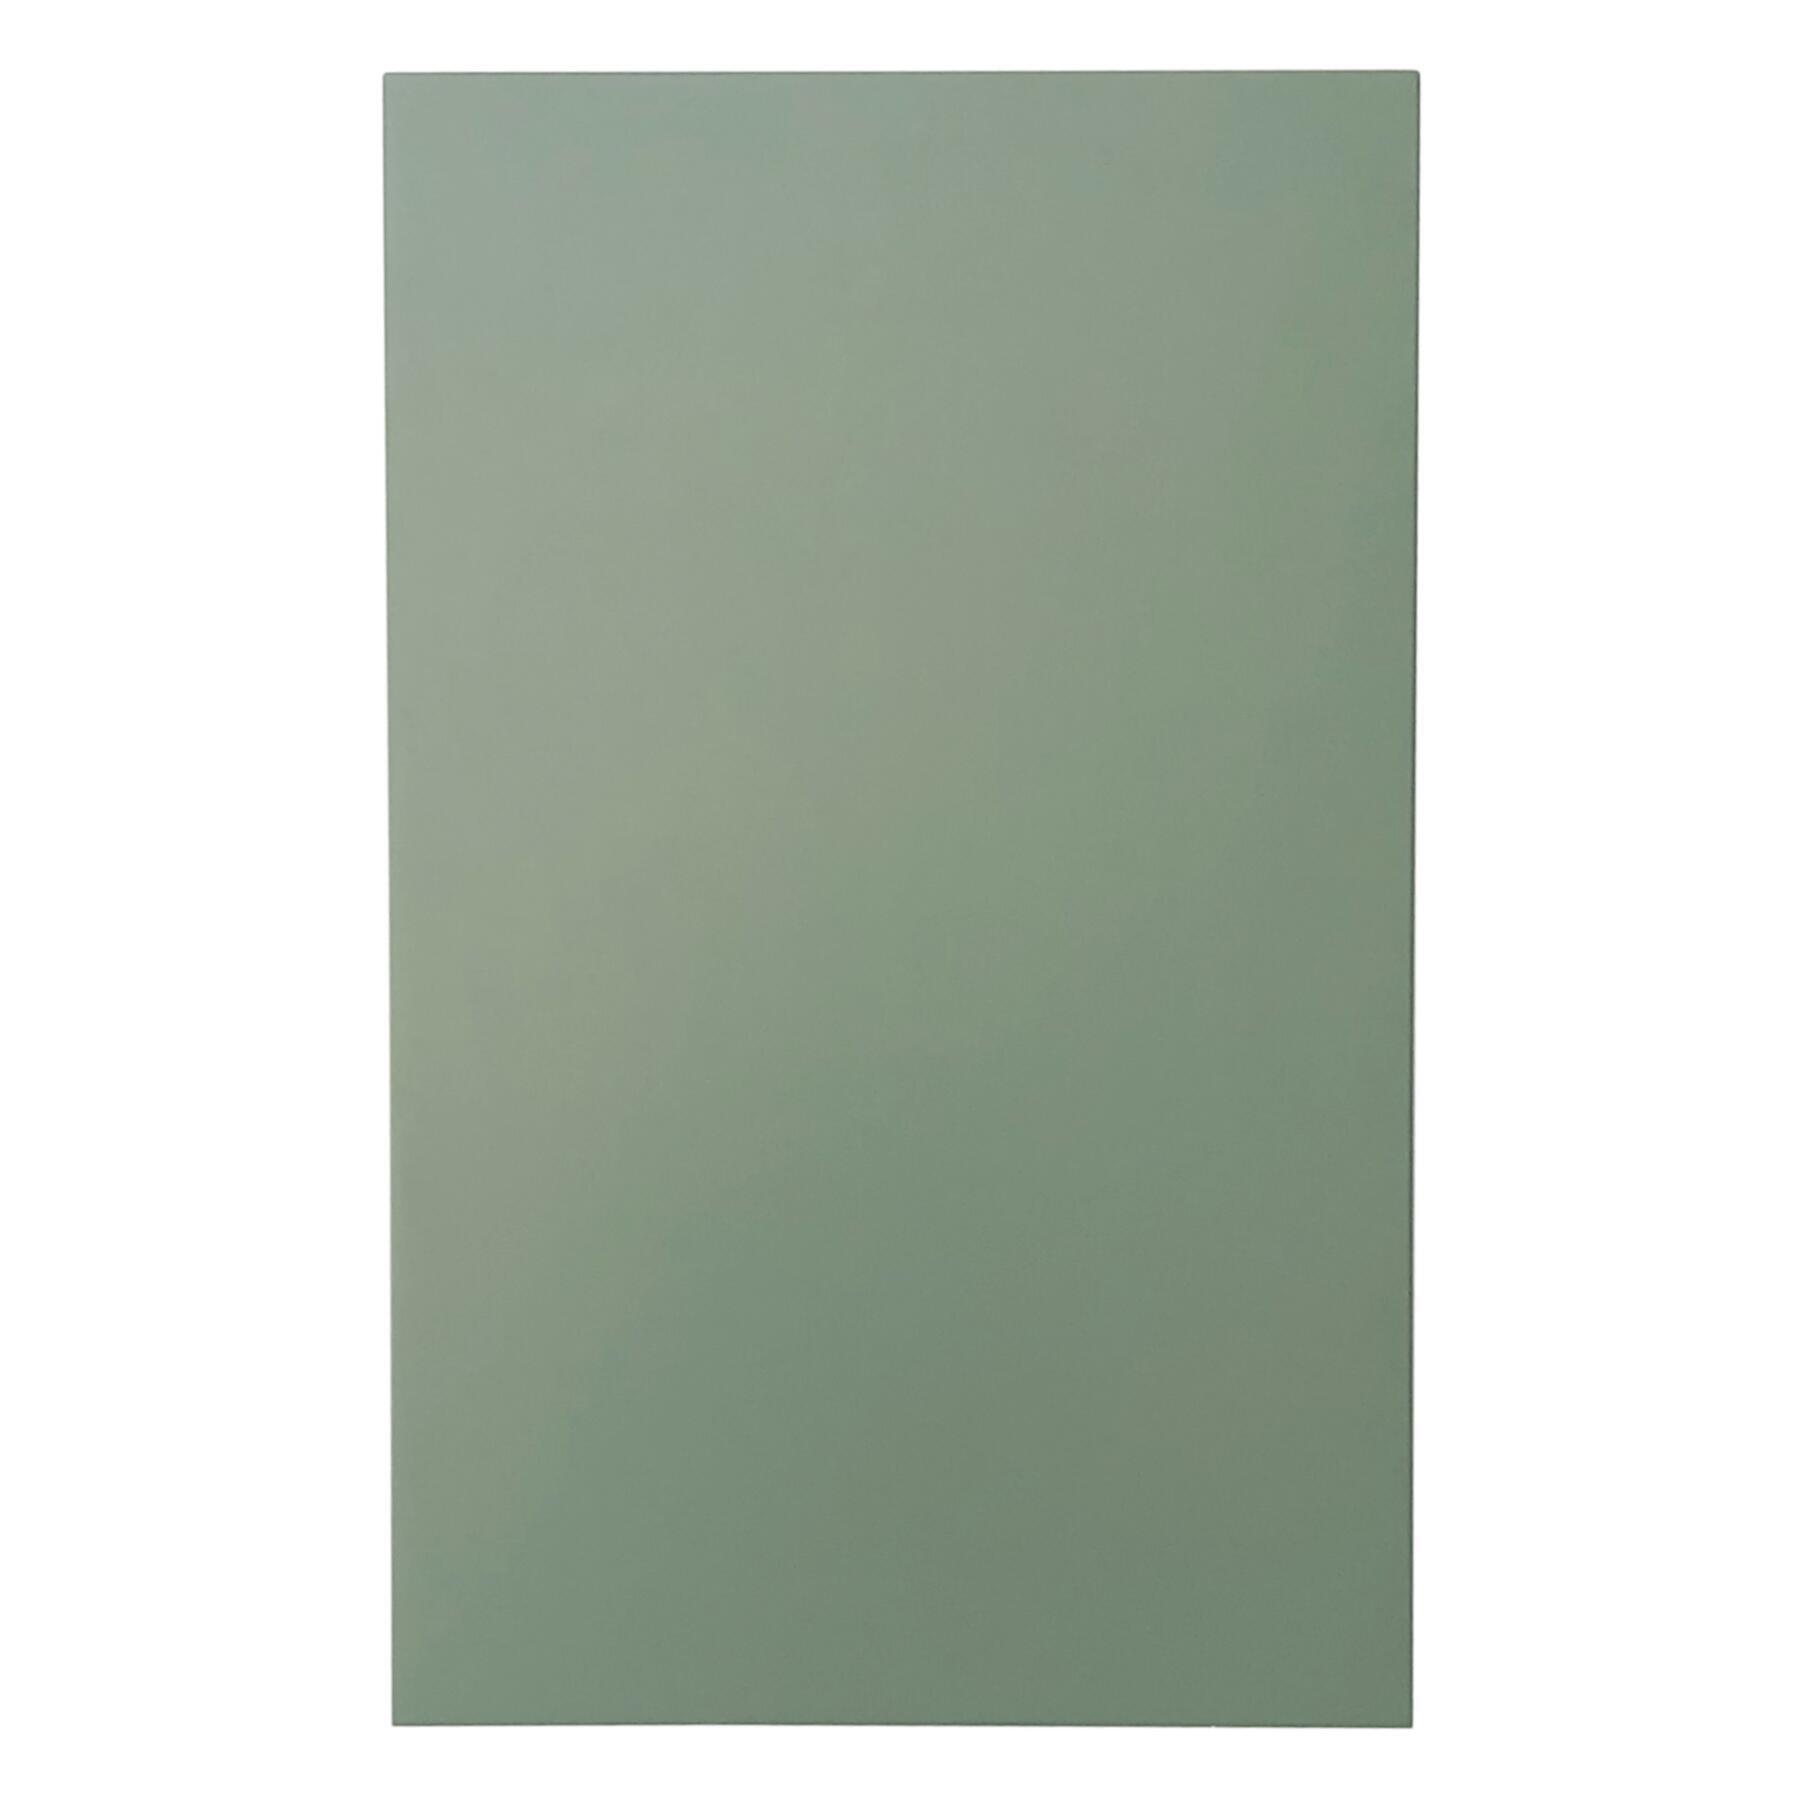 Anta DELINIA ID Parigi 76.5 x 44.7 verde muschio